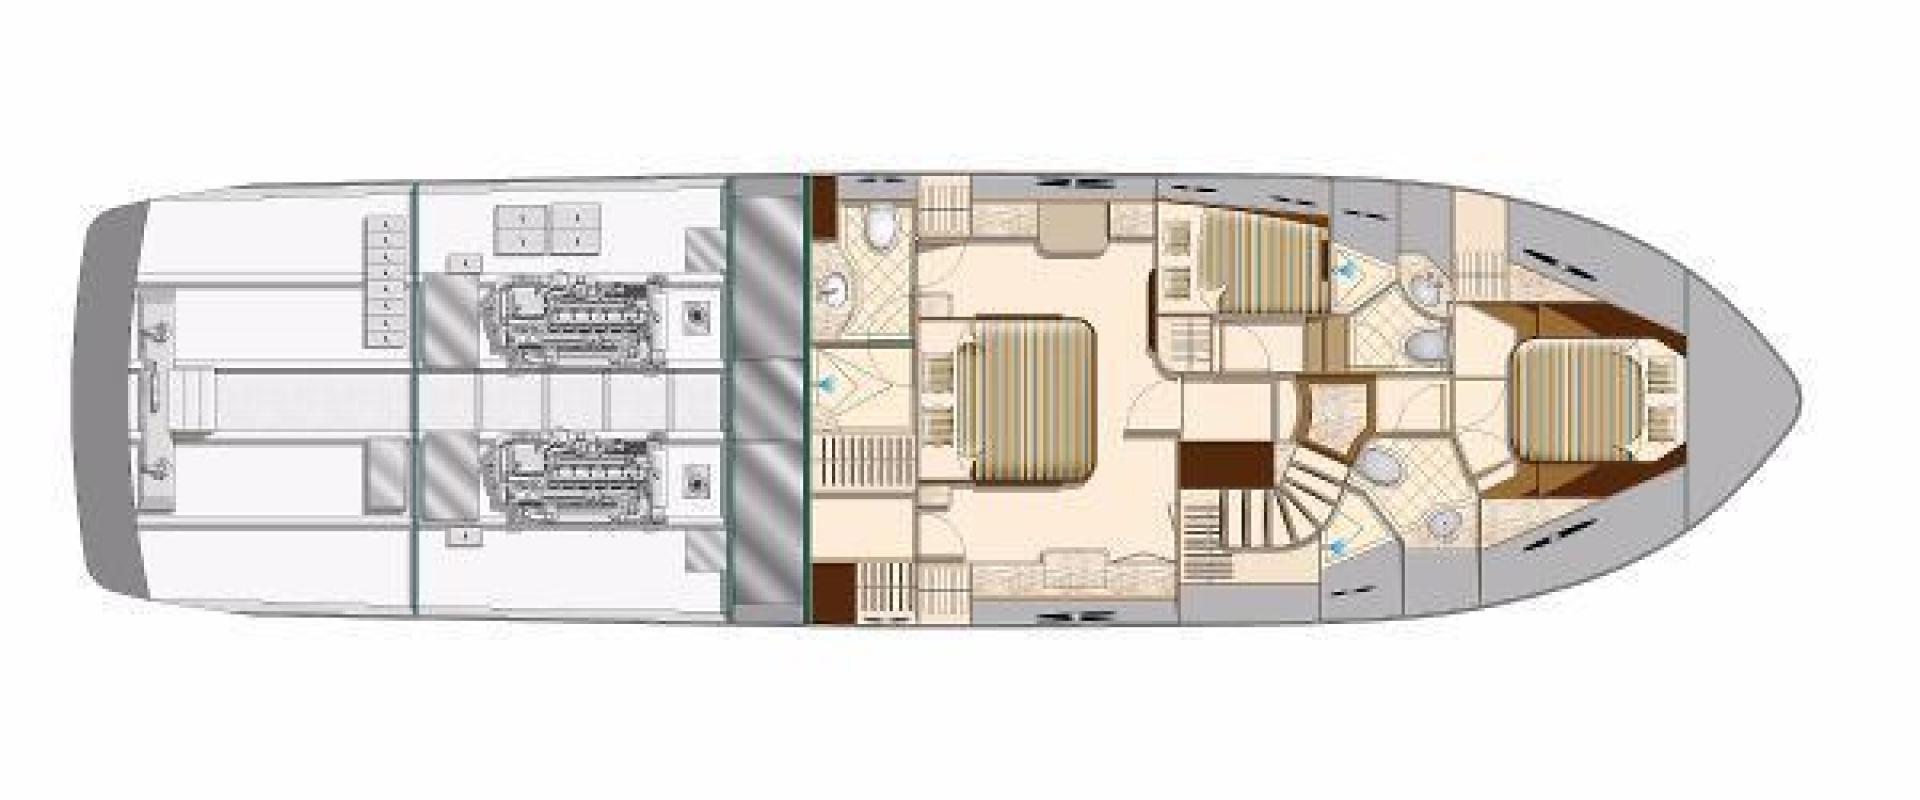 Hampton-650 Pilothouse 2020-For Order Fort Lauderdale-Florida-United States-1354501 | Thumbnail